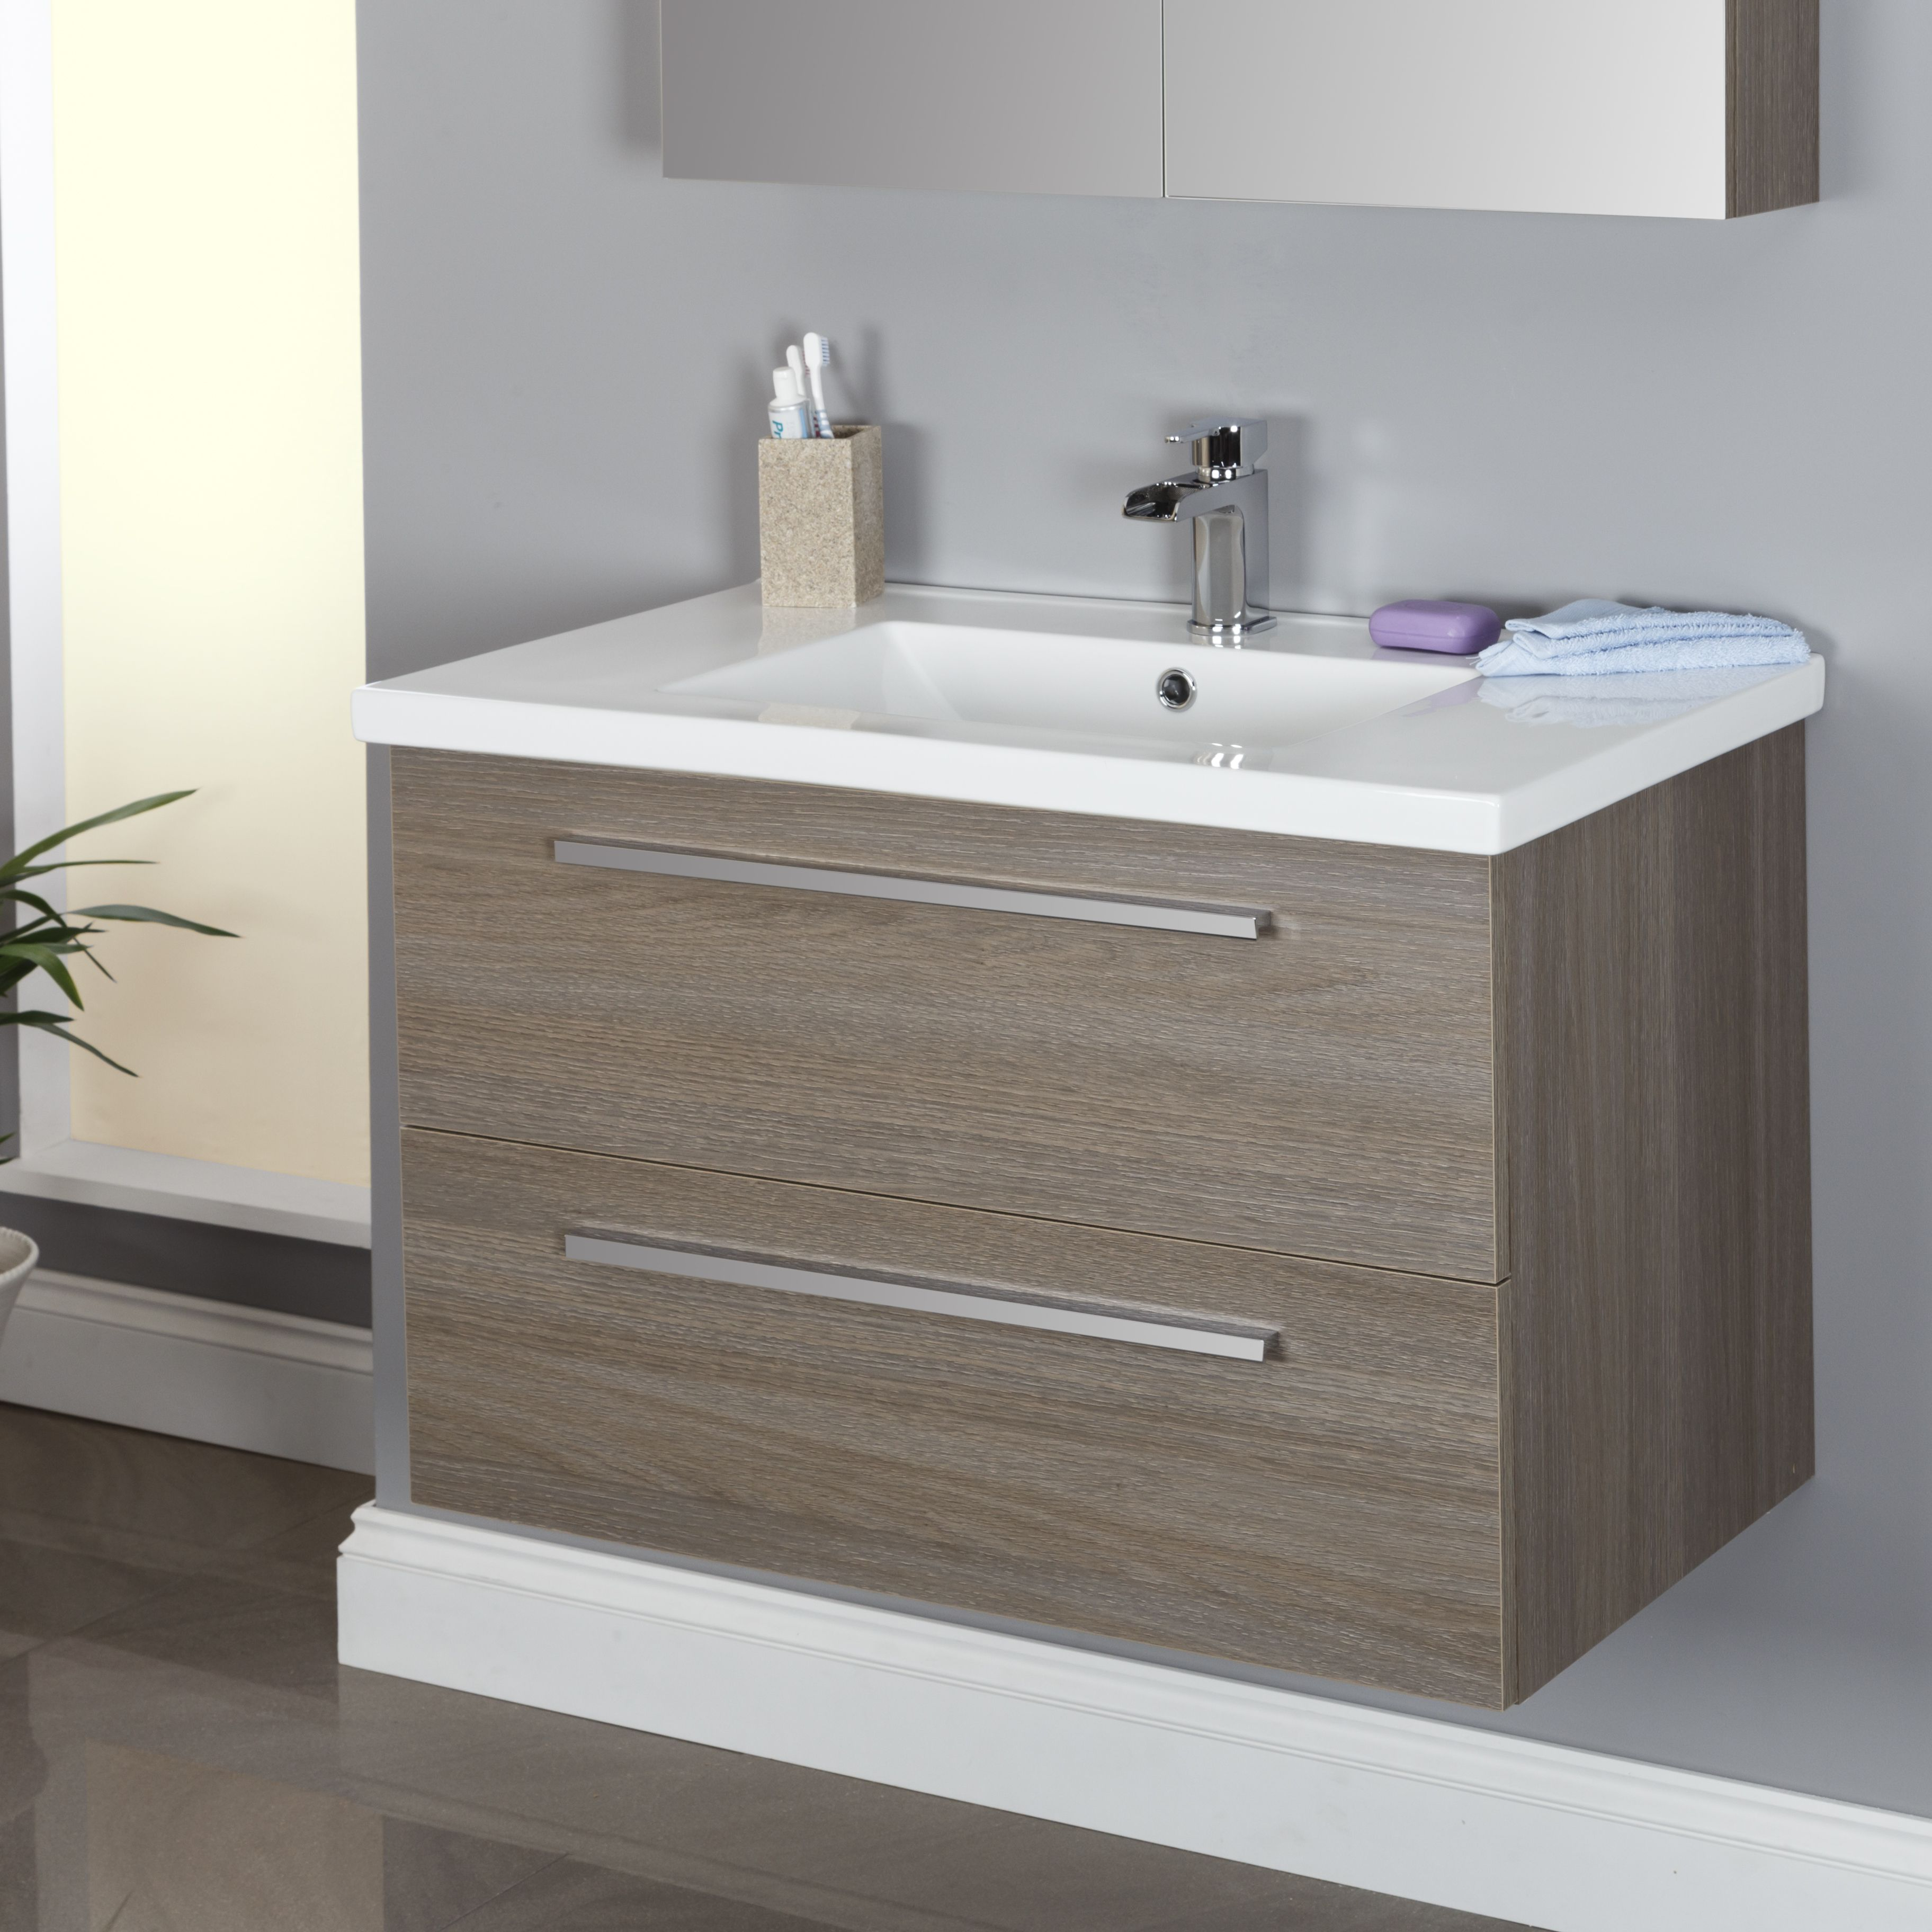 Vasari Wall Hung Vanity Unit Basin Grey Oak 800mm Width Best Wall Hung Vanity And Vanity